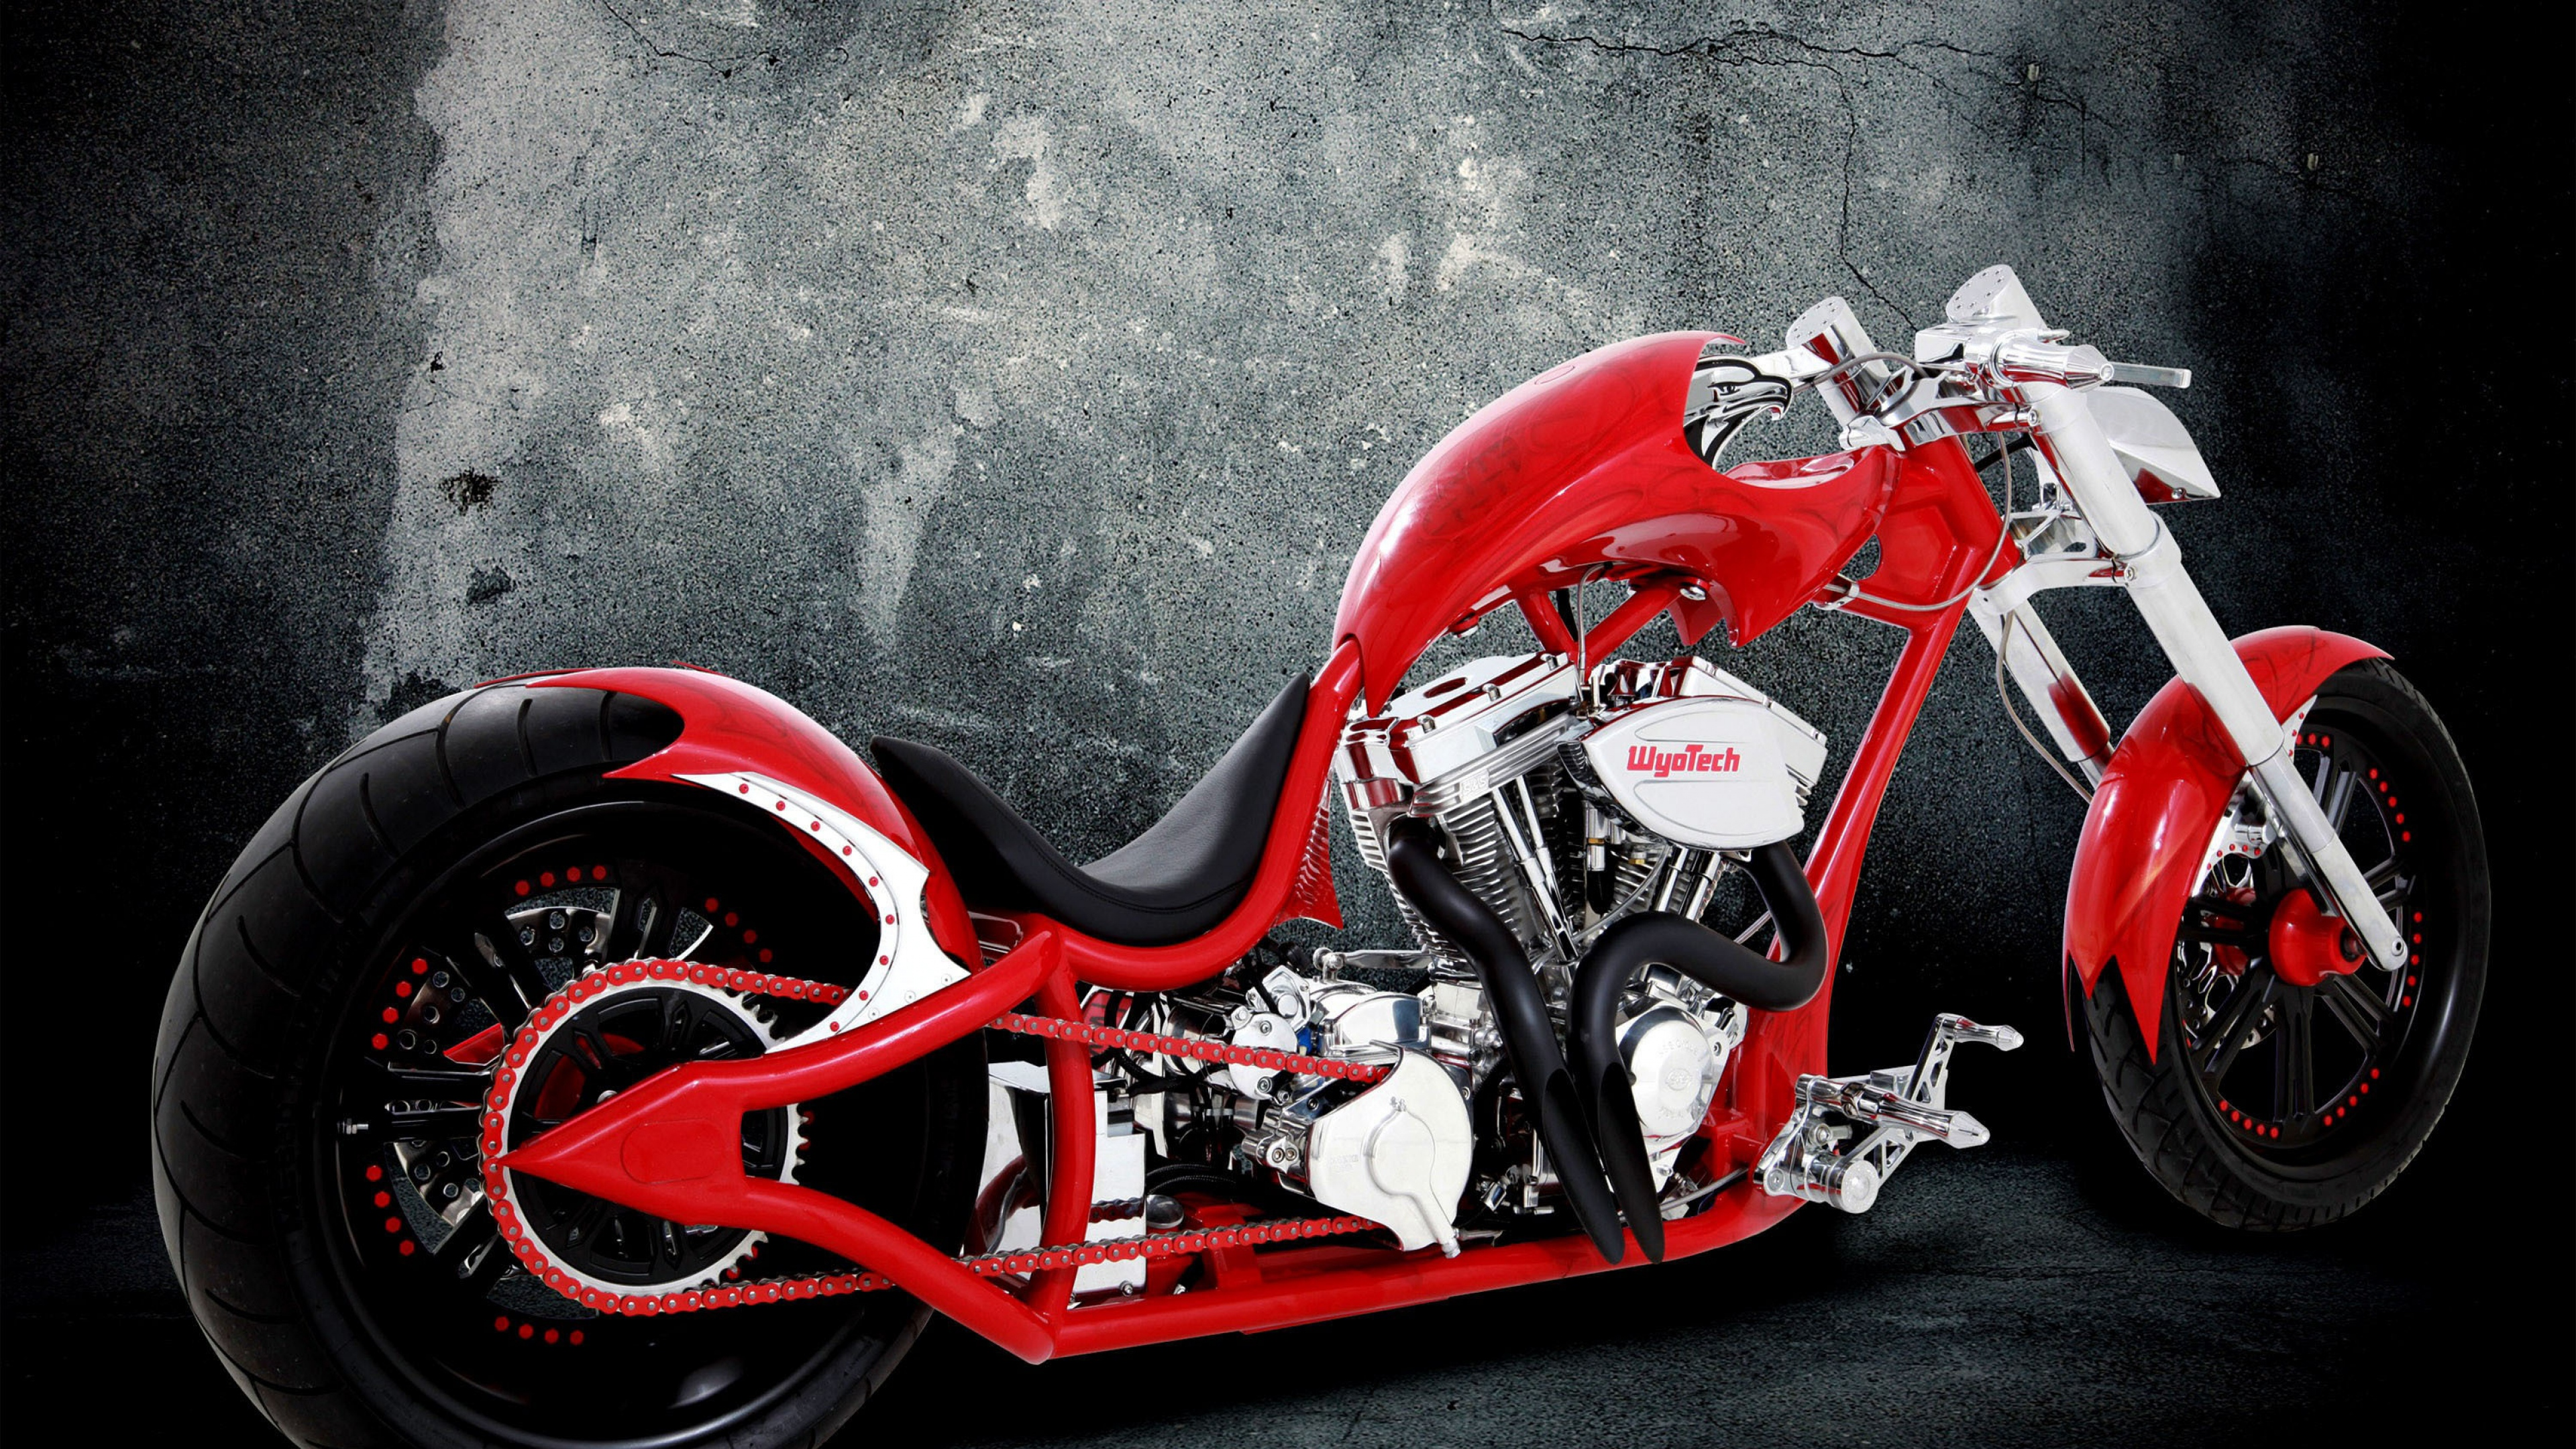 Free download Download Wallpaper 3840x2160 bike custom ...